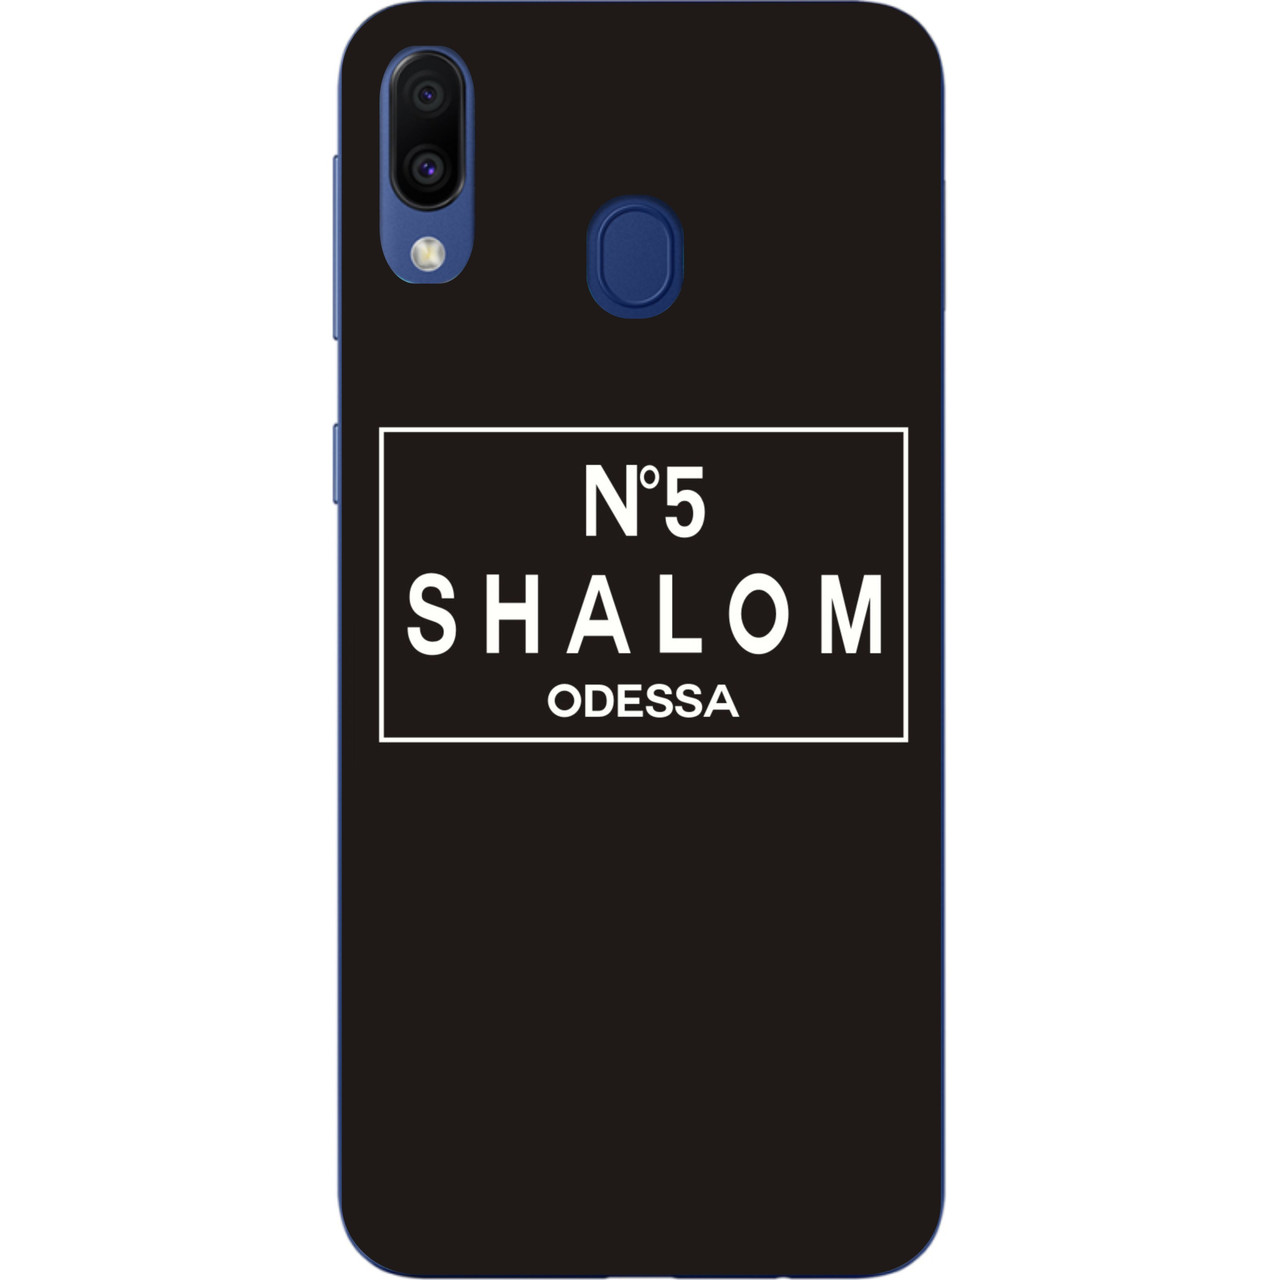 Антибрендовый силіконовий чохол для Samsung Galaxy A20 2019 A205F з картинкою Shalom №5 Odessa